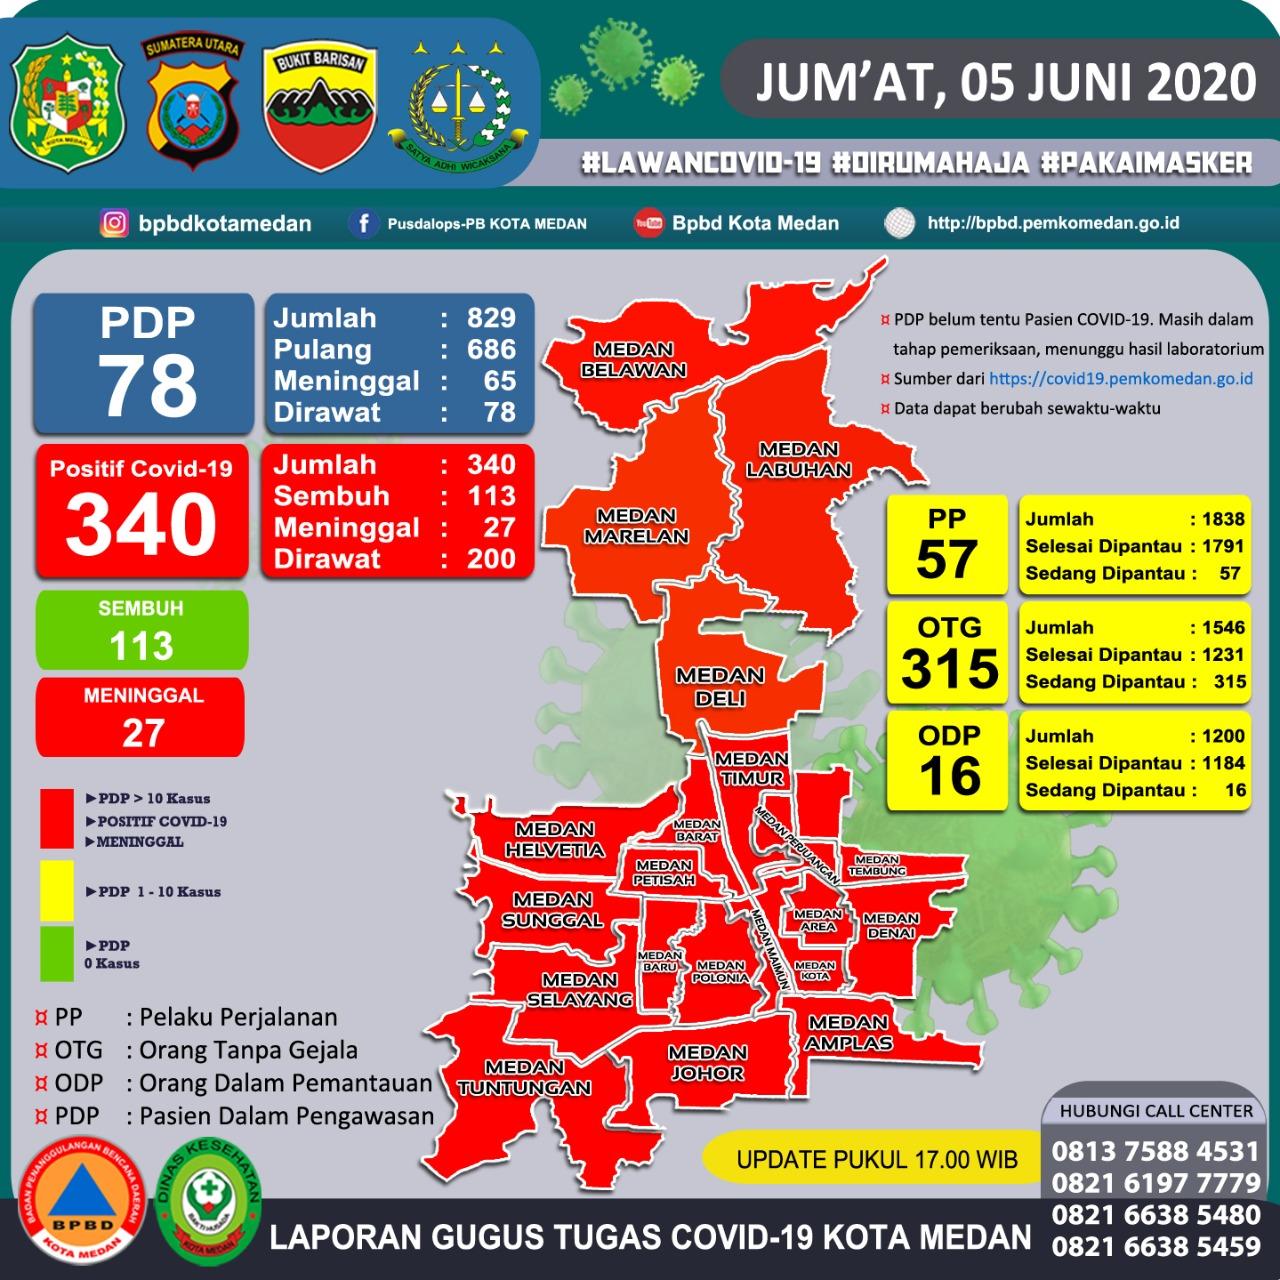 Prihatin Seluruh Kota Medan Masuk Zona Merah, DPRD Medan Akan Bentuk Pansus